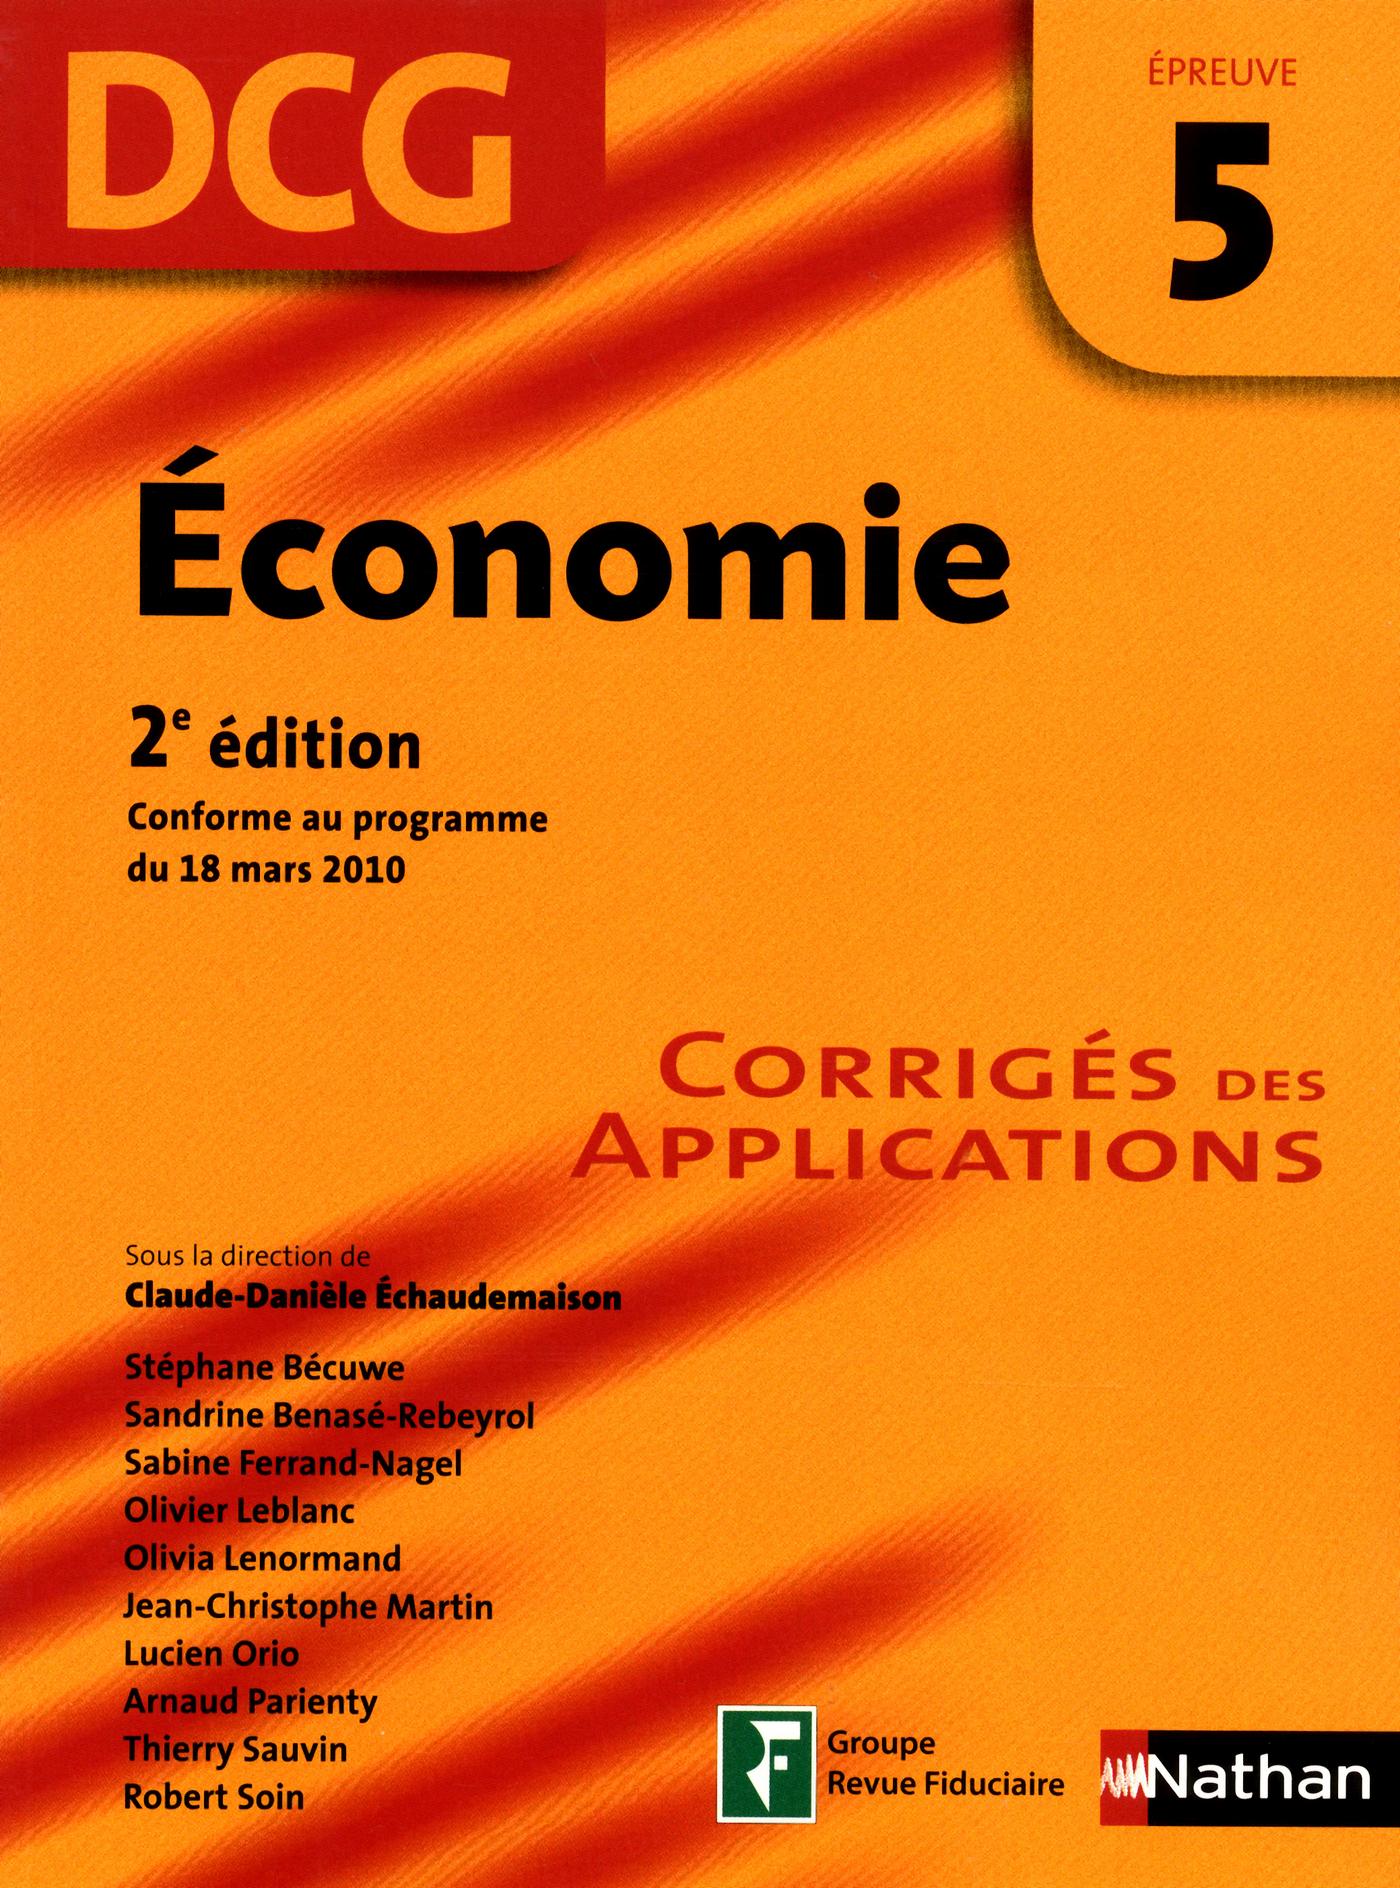 Economie - épreuve 5 - DCG corrigés (ebook)